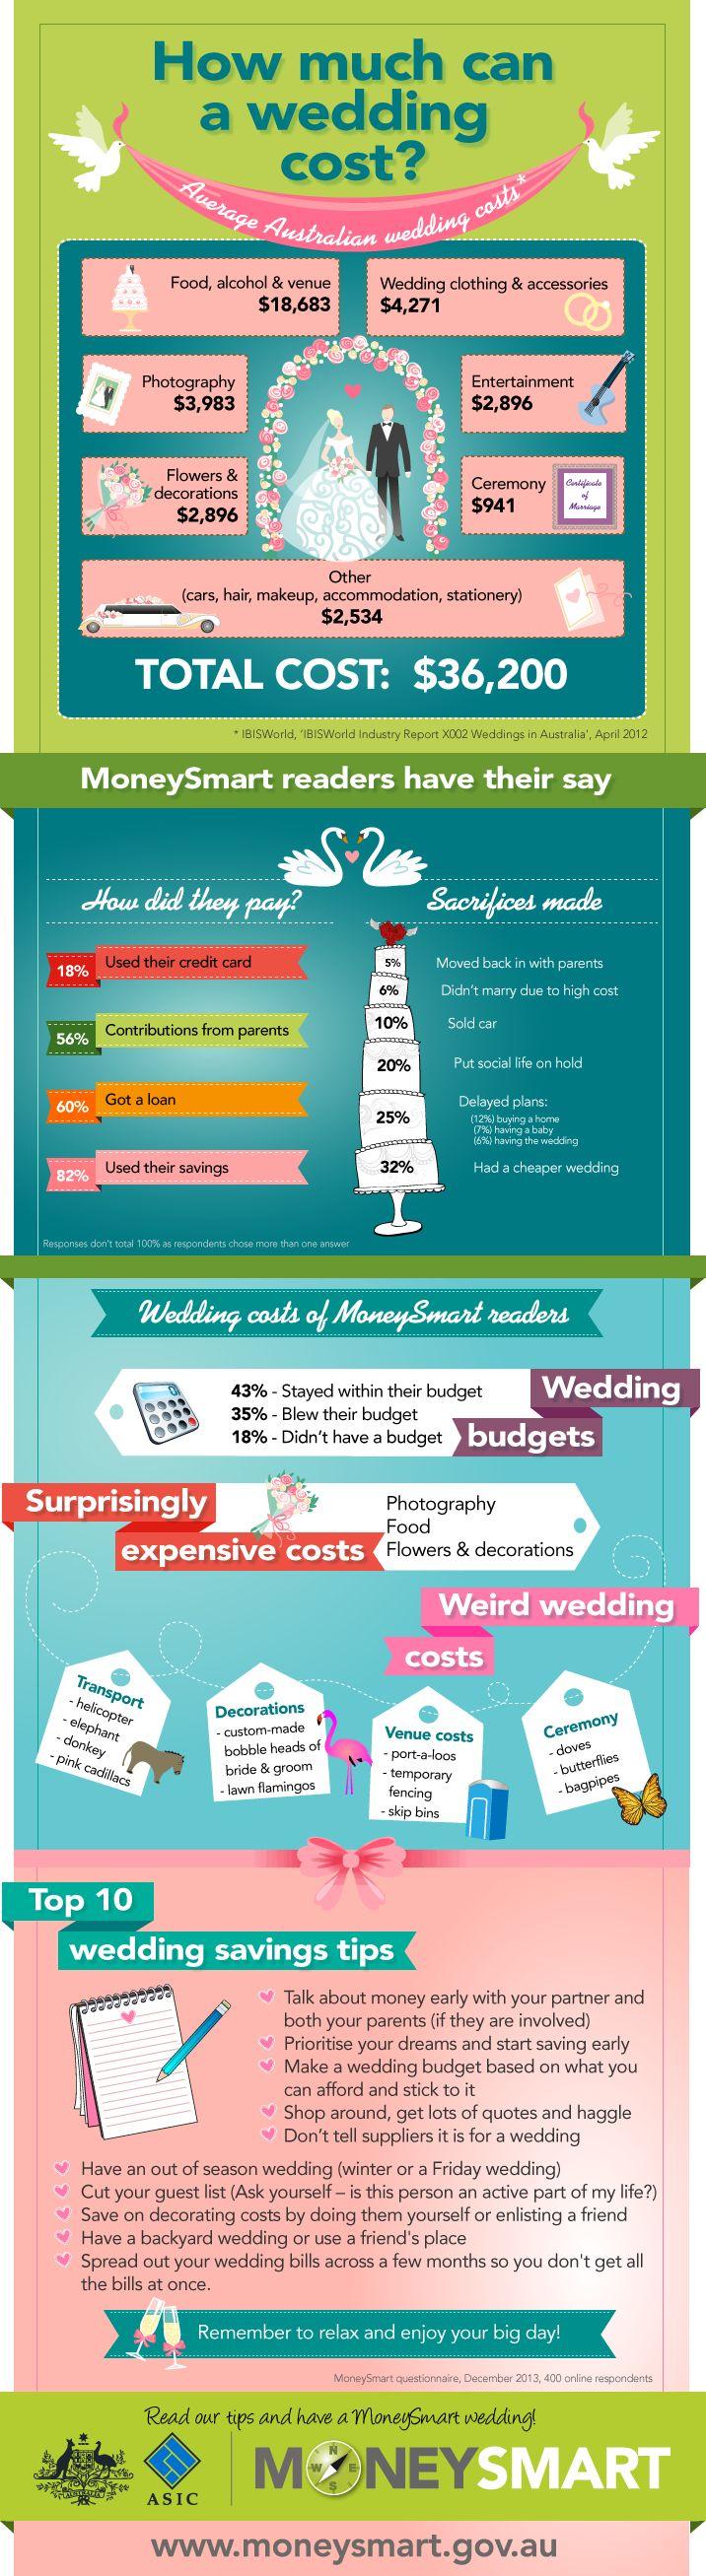 the average australian wedding costs 36200 infographic lifehacker australia